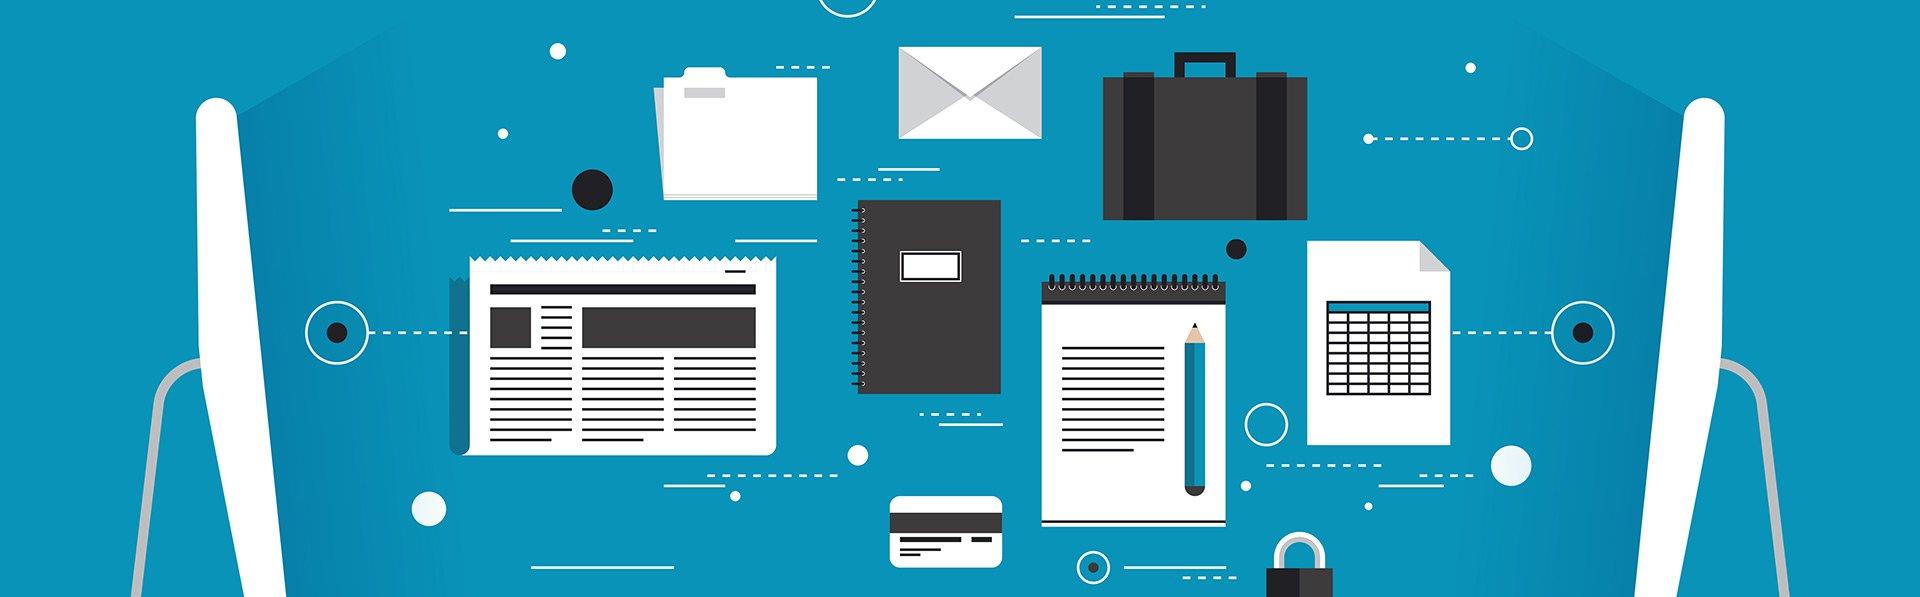 data_transfer_information_web_documents_flat_design_vector_illustration_concept_connection_icons_internet_communication_network_computing